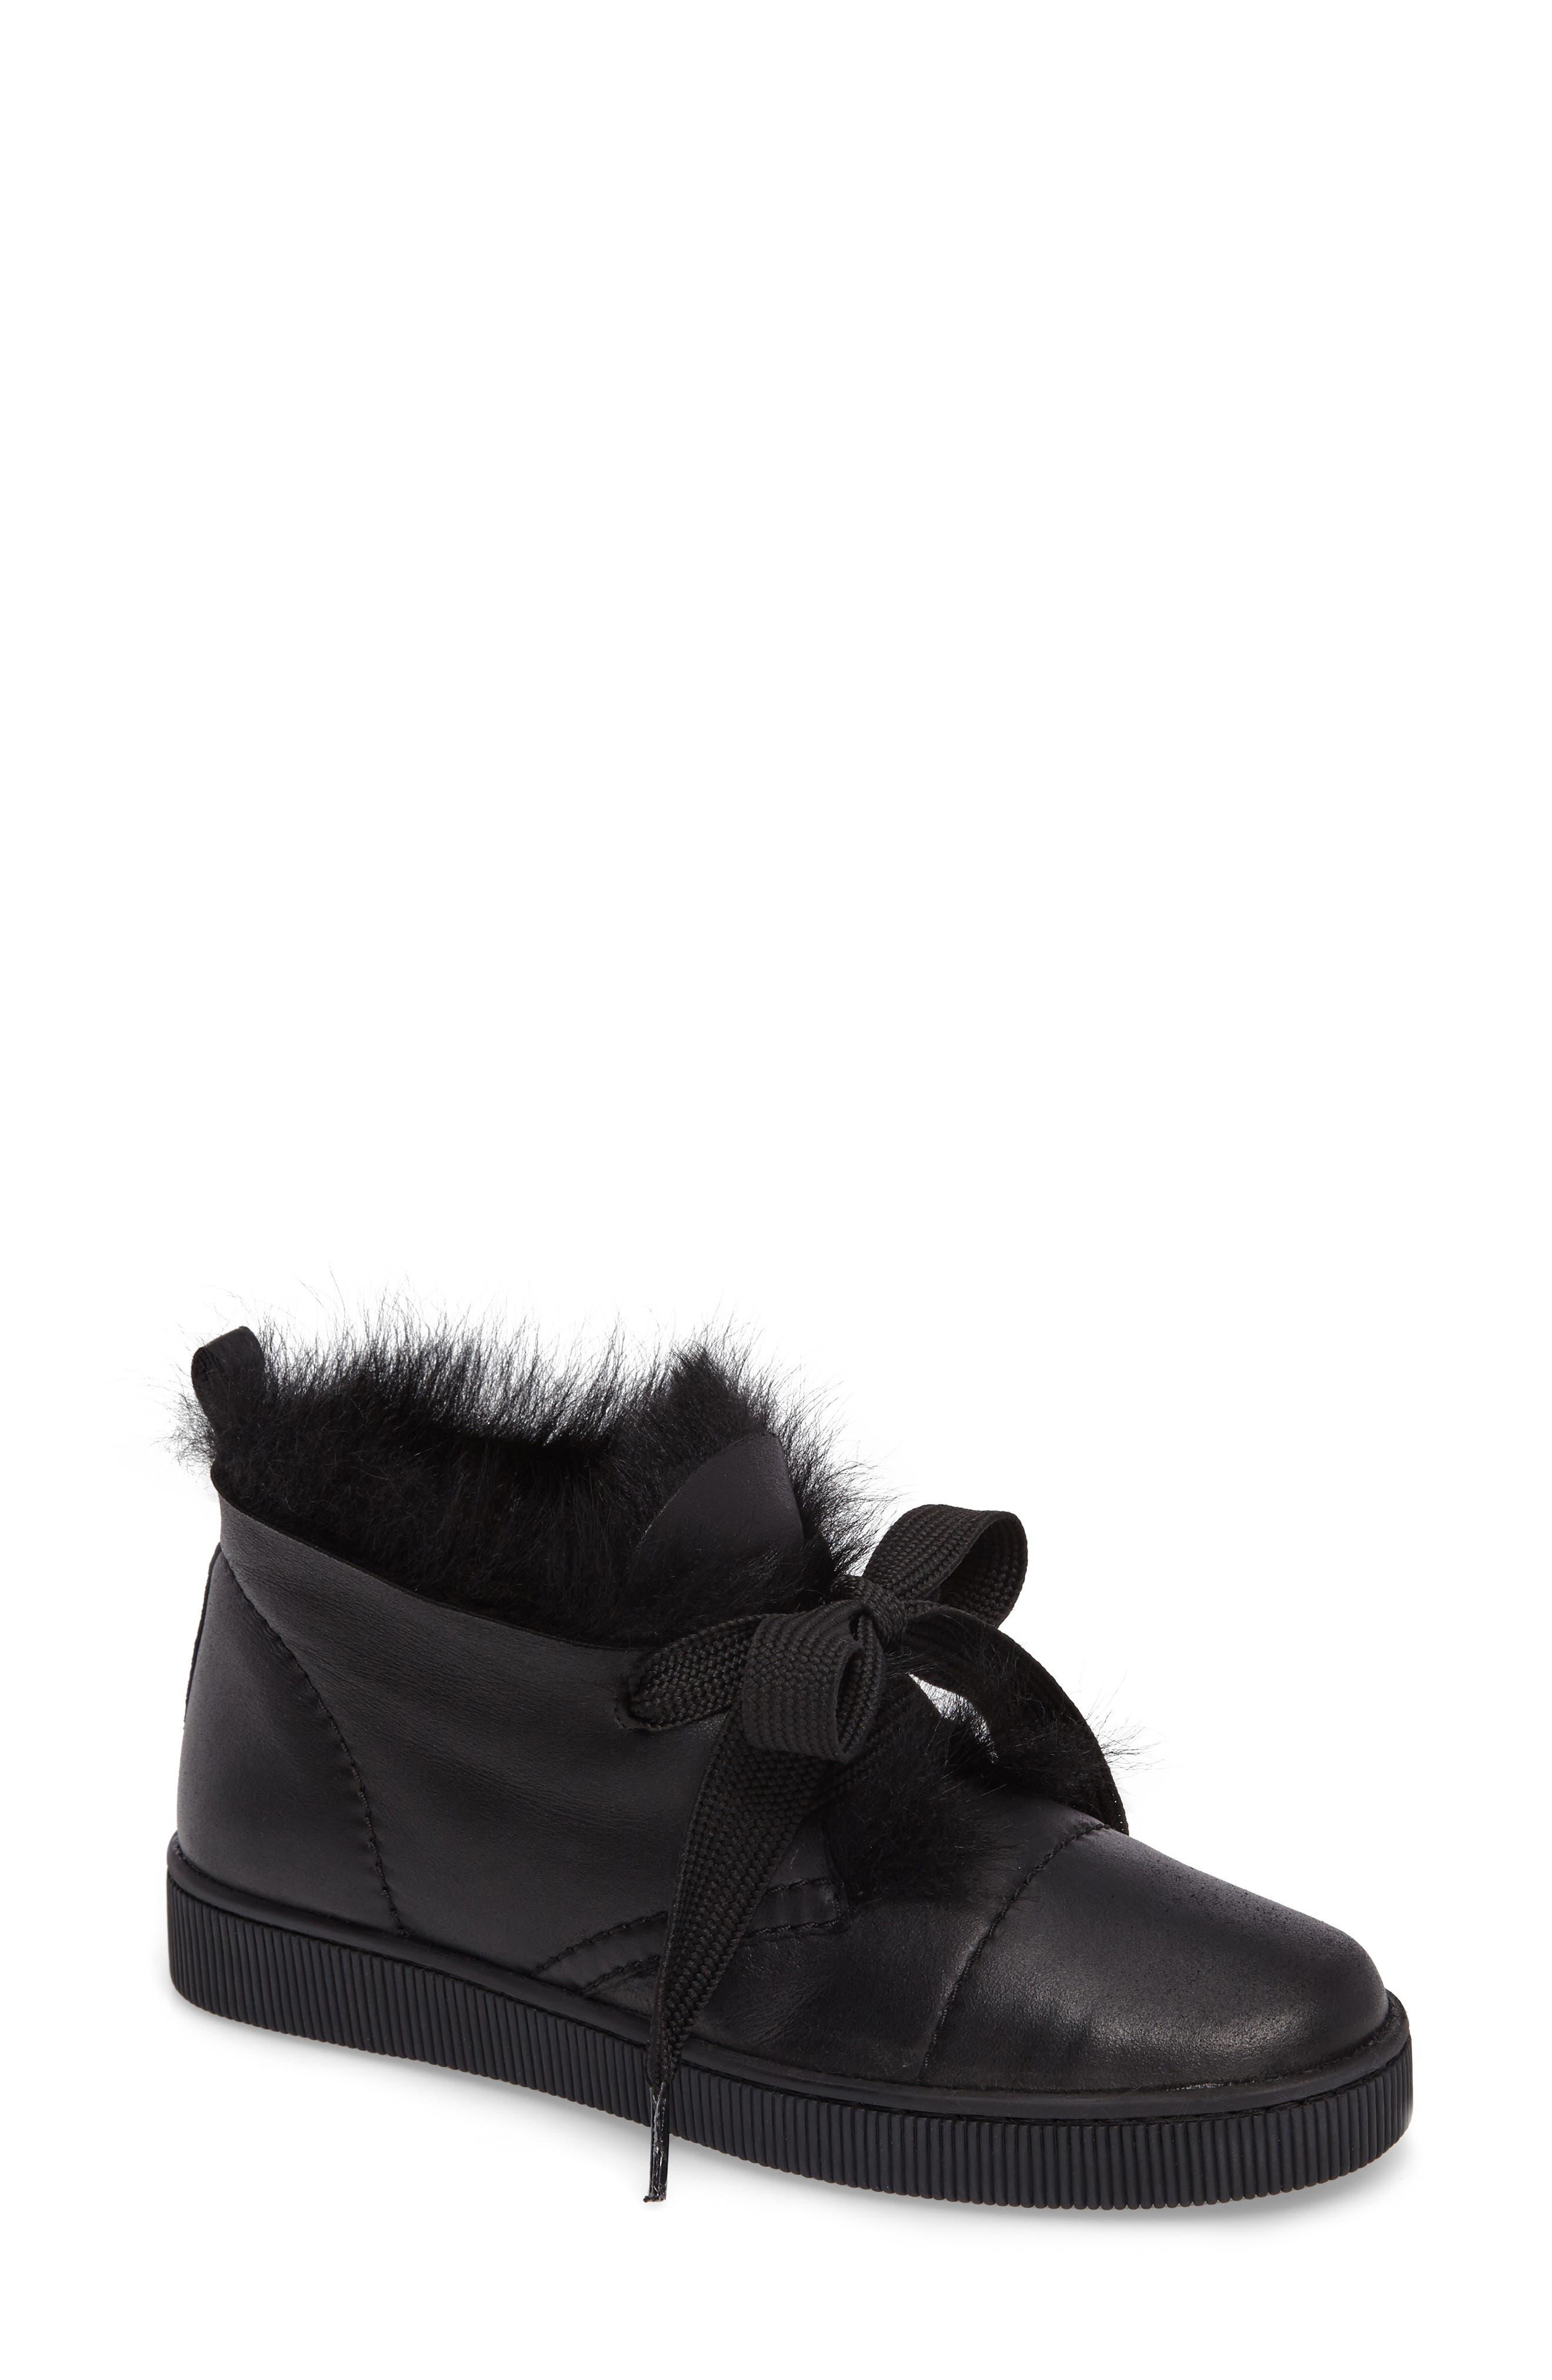 Pedro Garcia Parley Genuine Shearling & Leather Sneaker (Women)